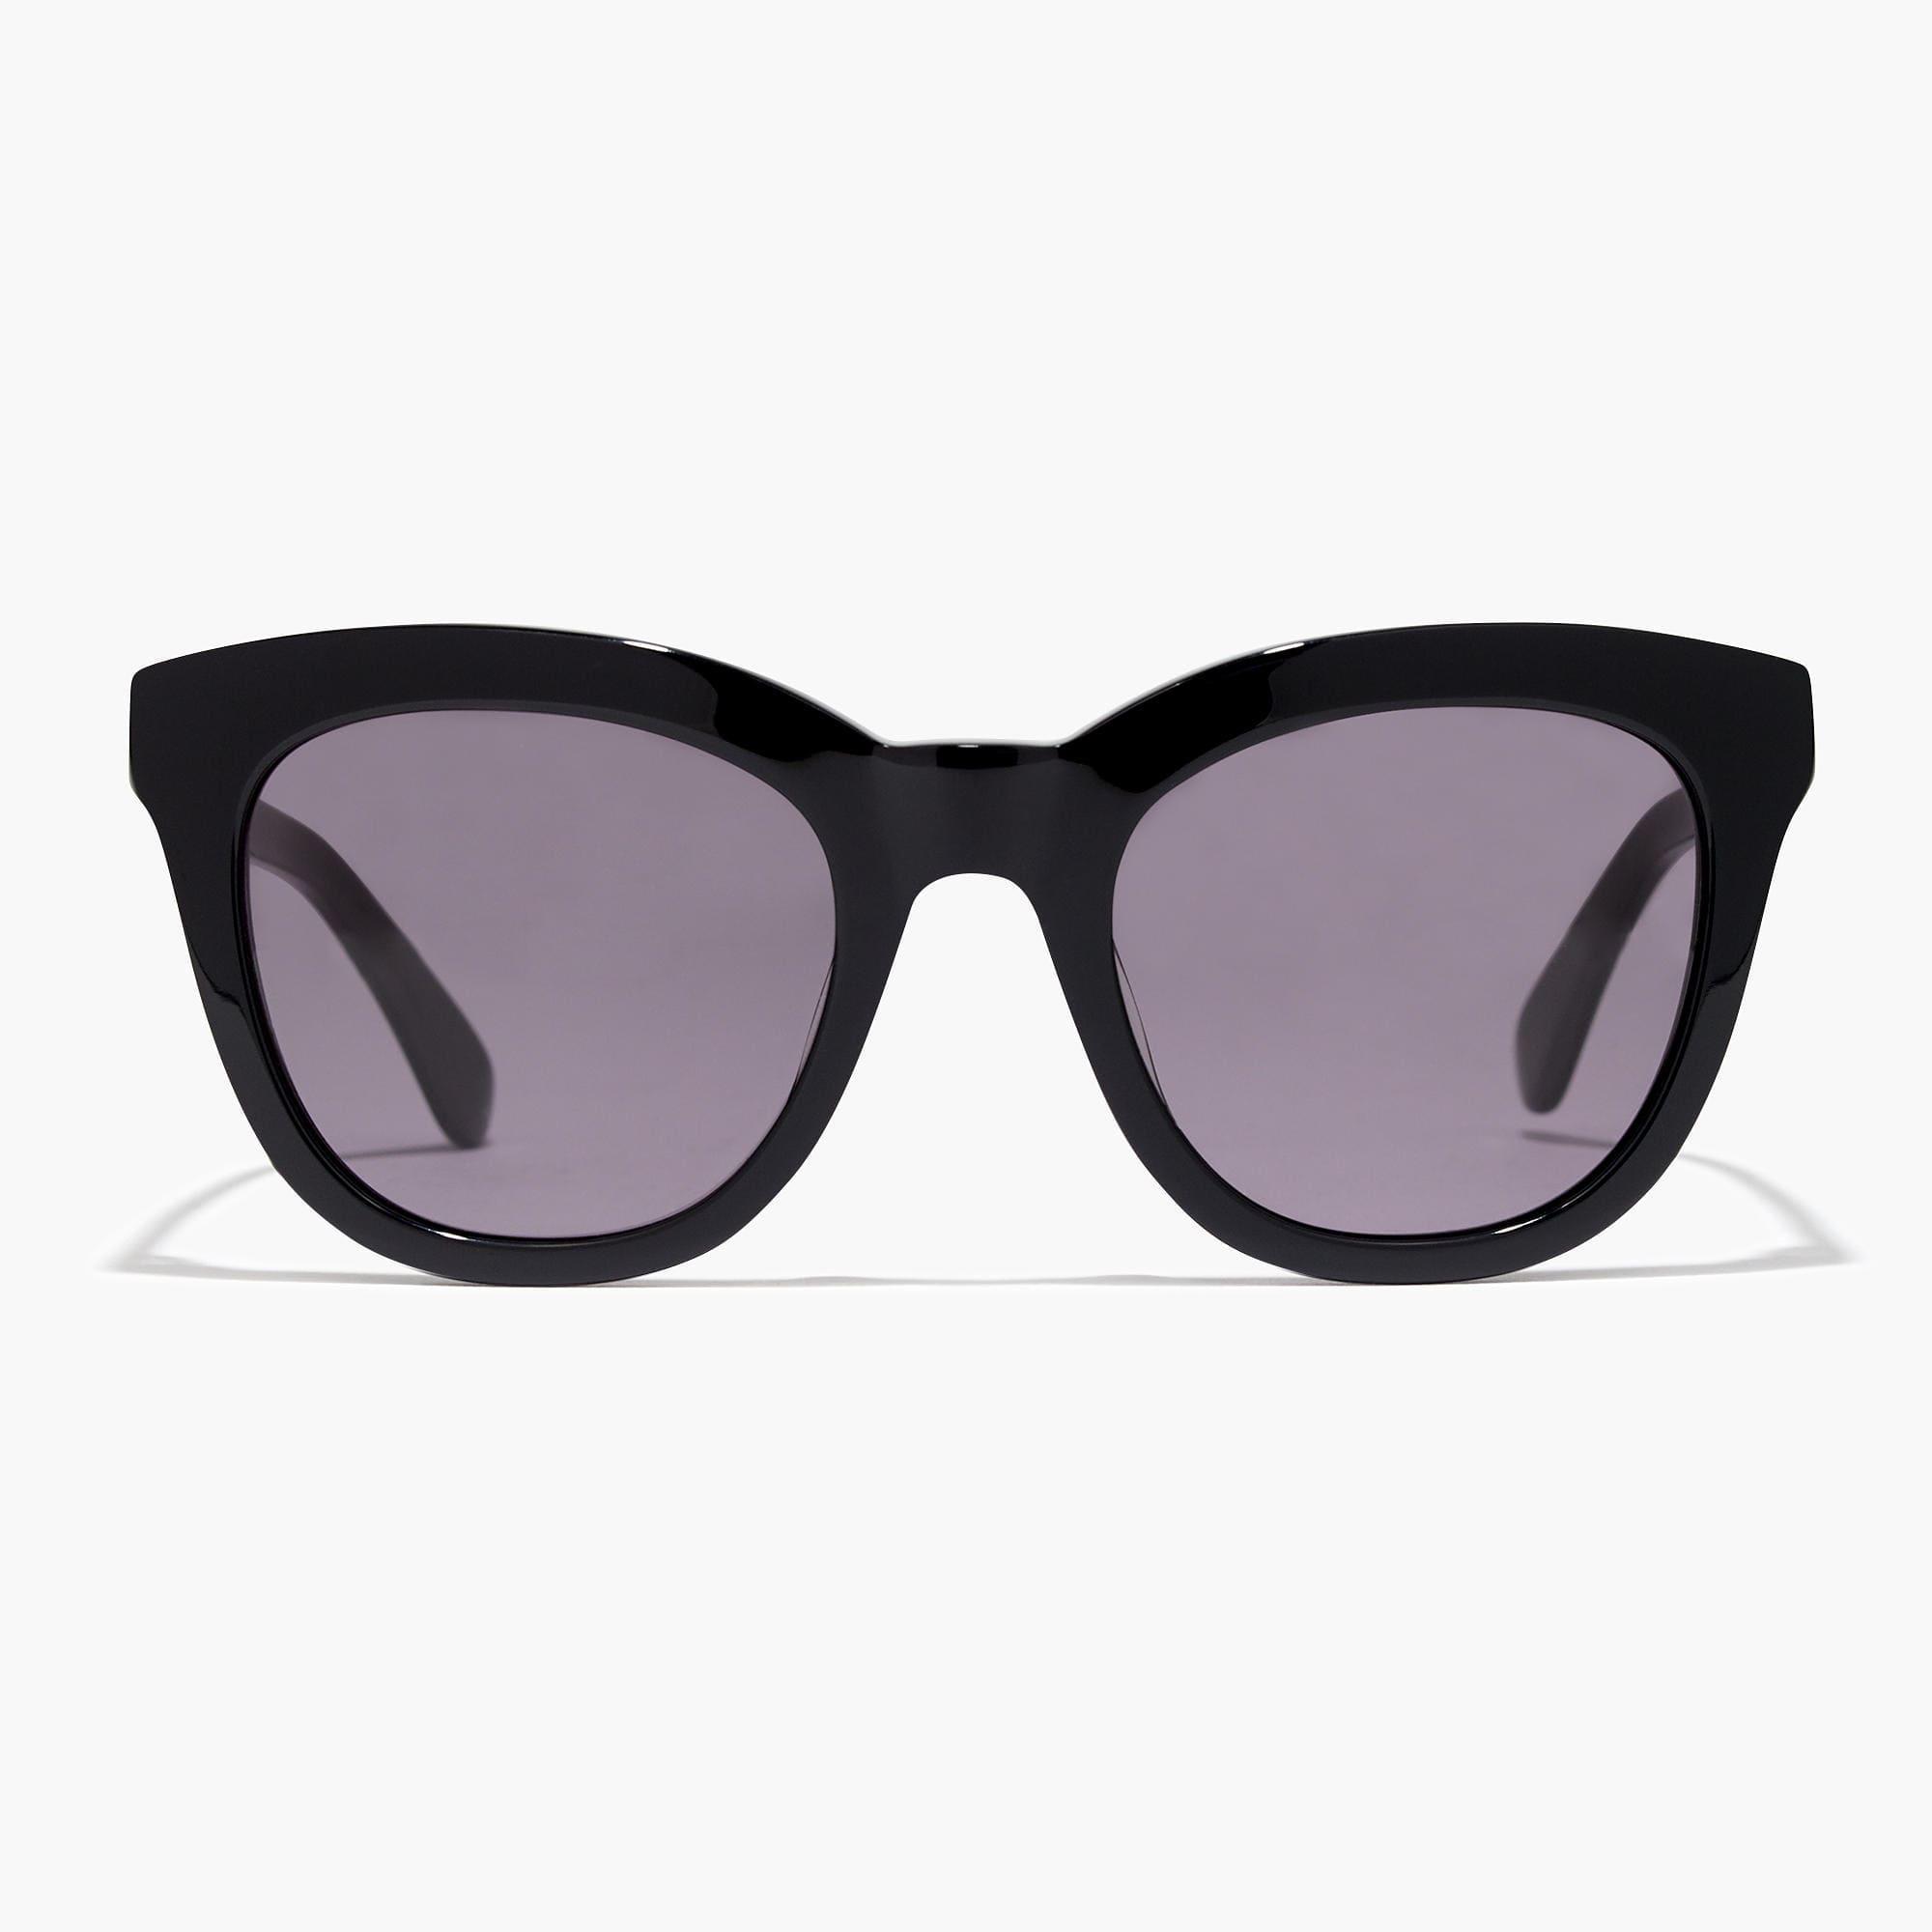 f6fc80403a Lyst - J.Crew Betty Sunglasses in Black